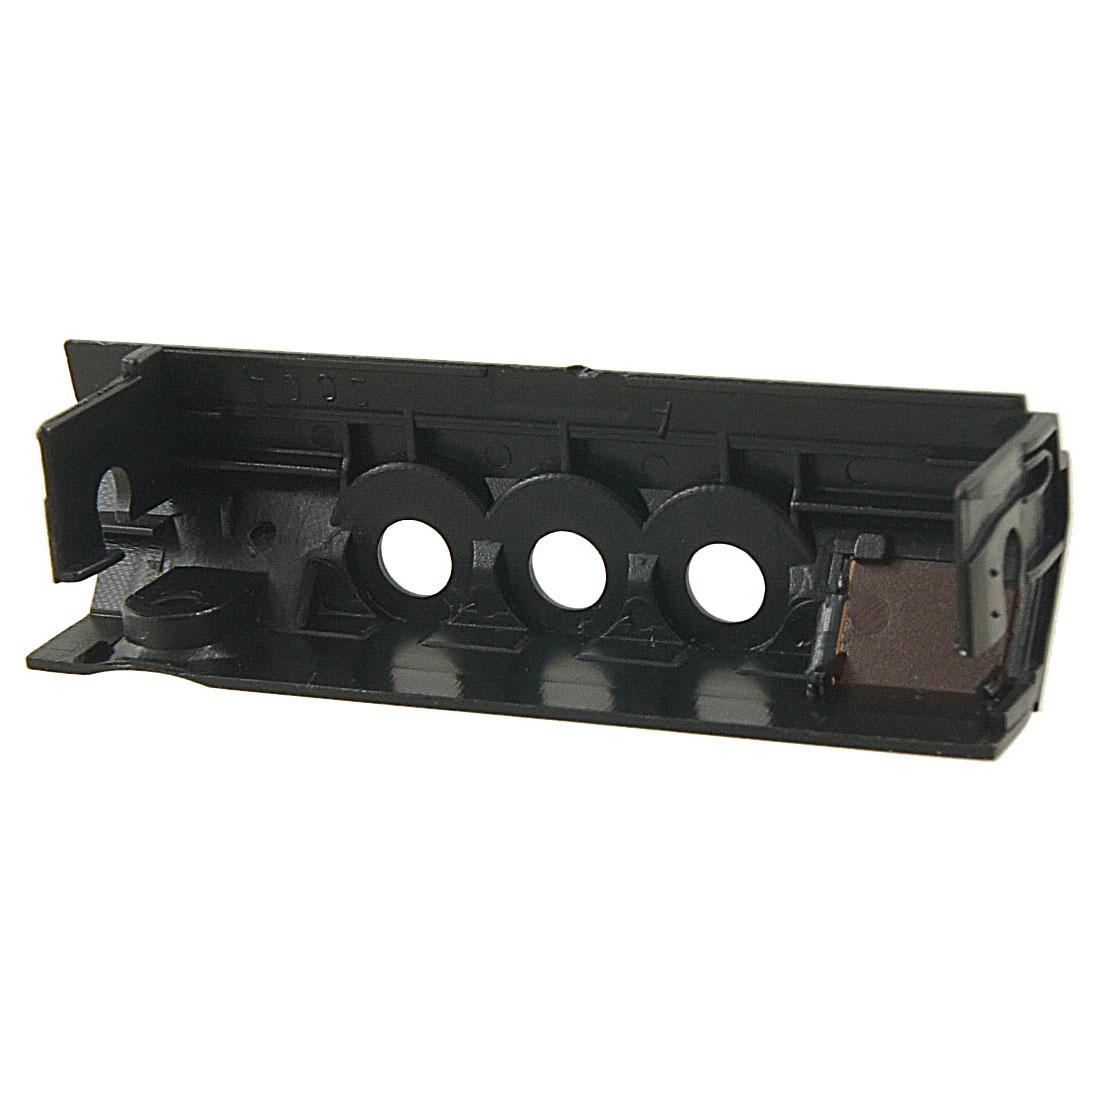 Black Plastic Hard Drive Cover for IBM Lenovo Thinkpad T20